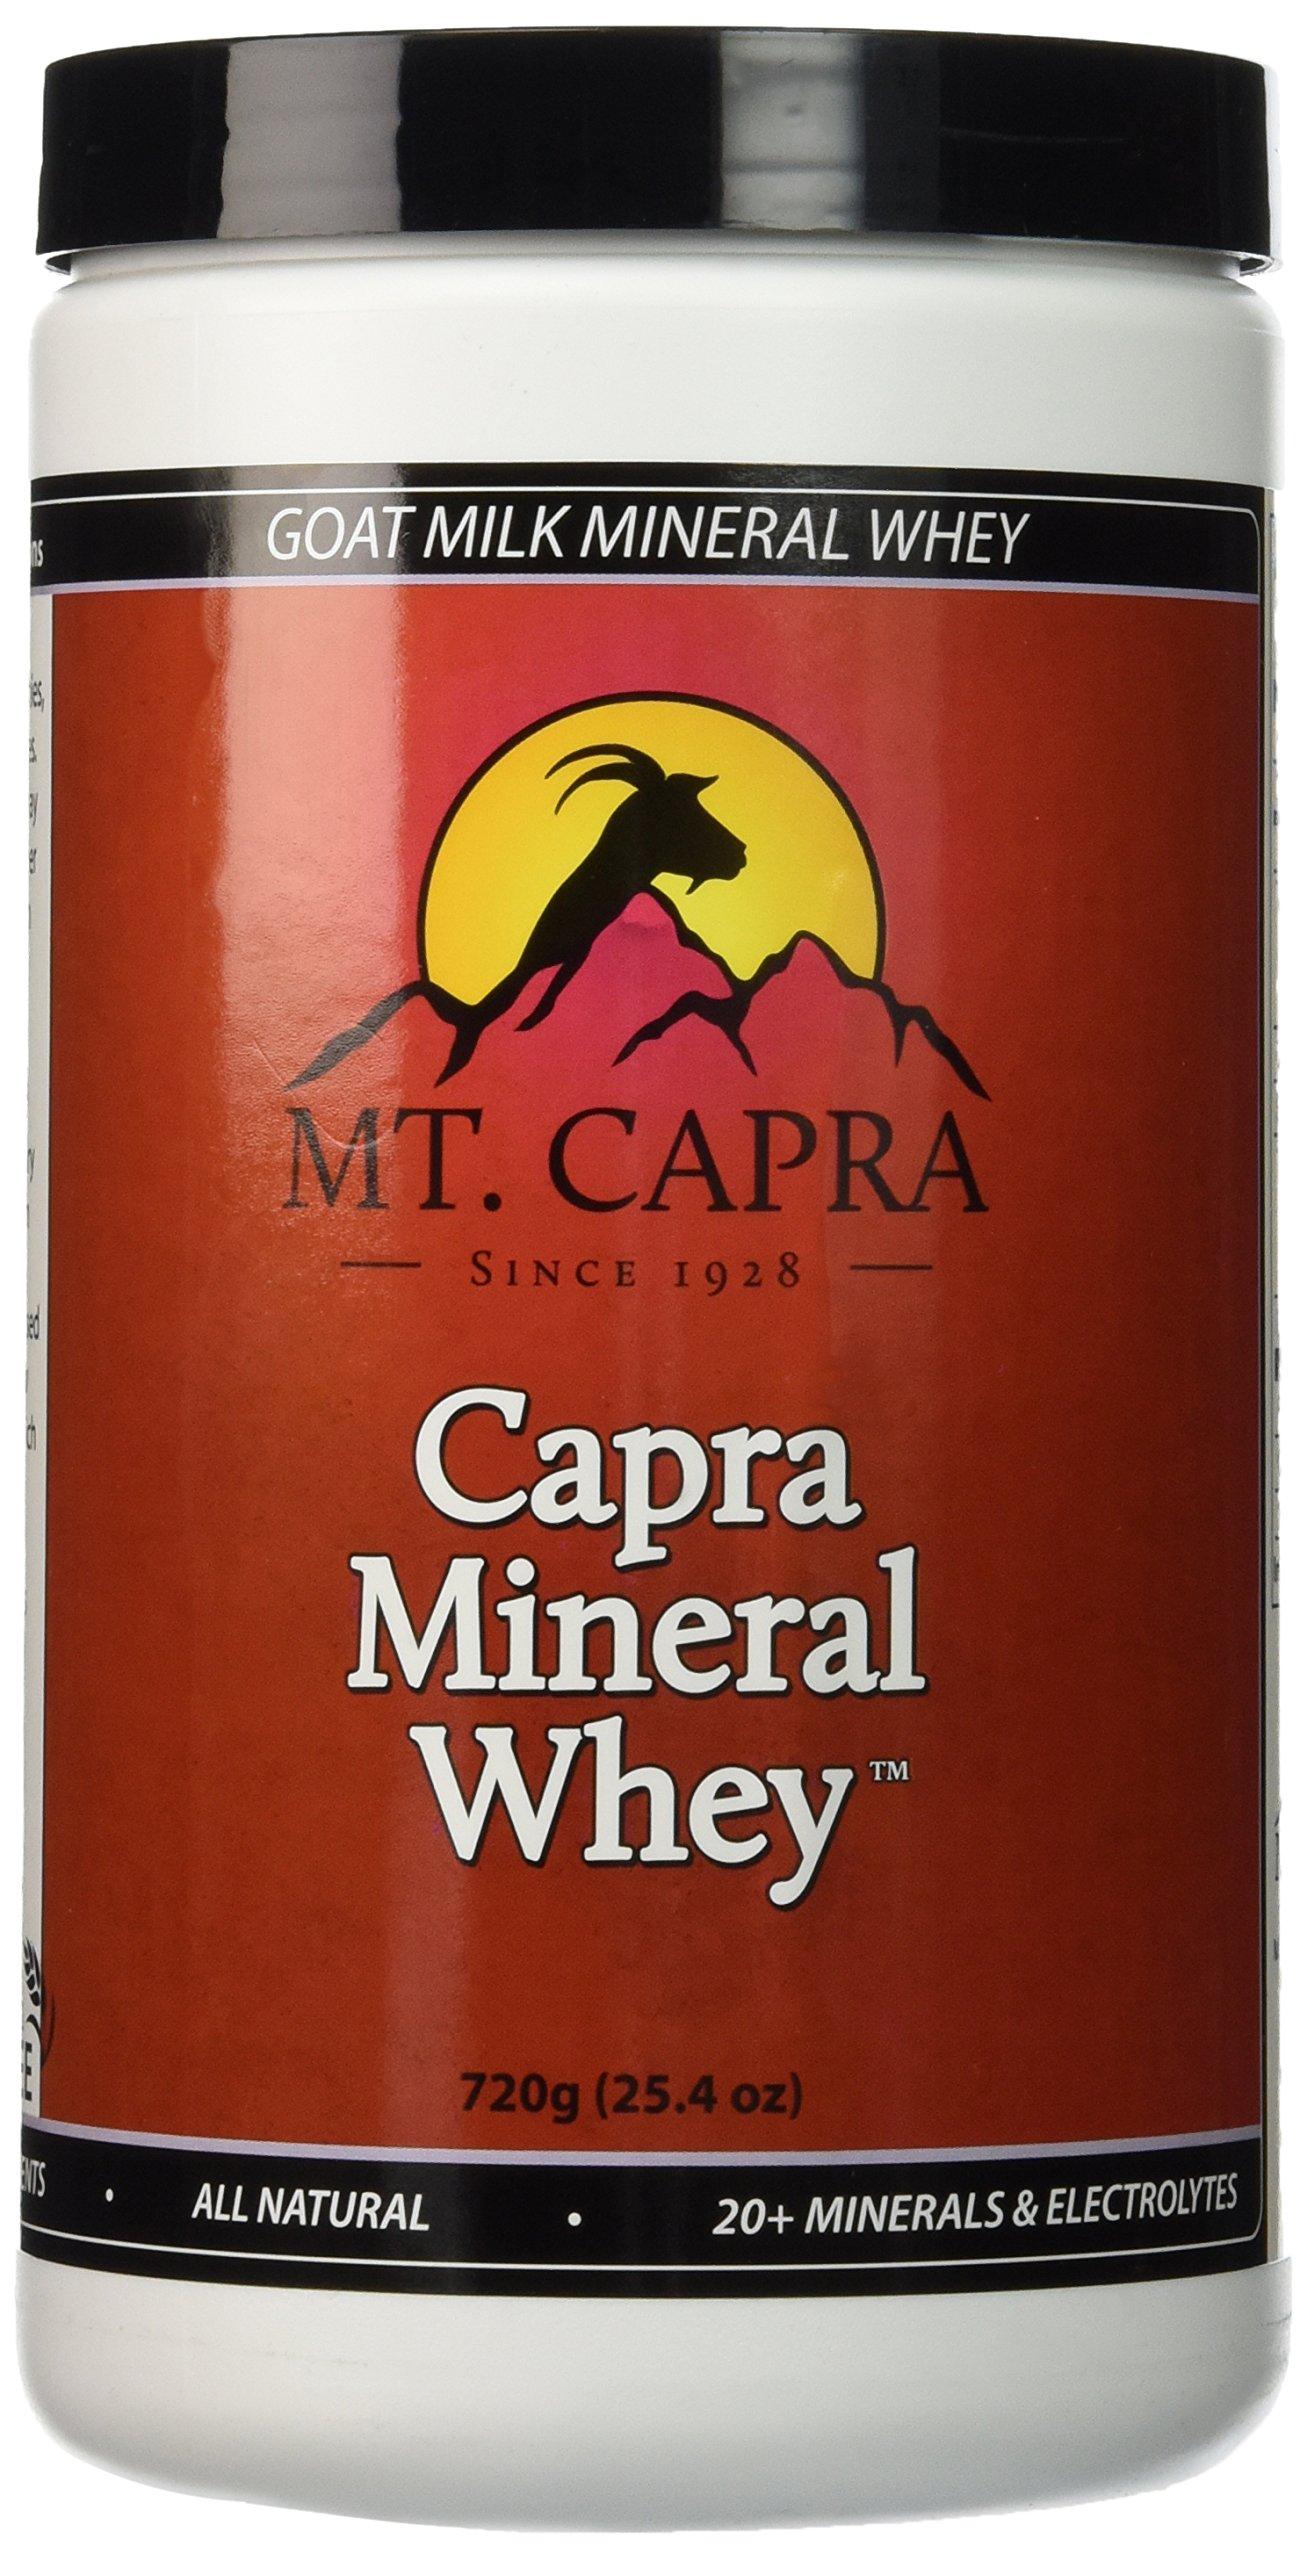 Mt. Capra - Capra Mineral Whey, 720 grams Powder Goat Milk Minerals and Electrolytes From Grass-Fed Pacific Northwest Goats Bio-Organic Potassium, Calcium, Phosphorus, Magnesium Supplement Complex